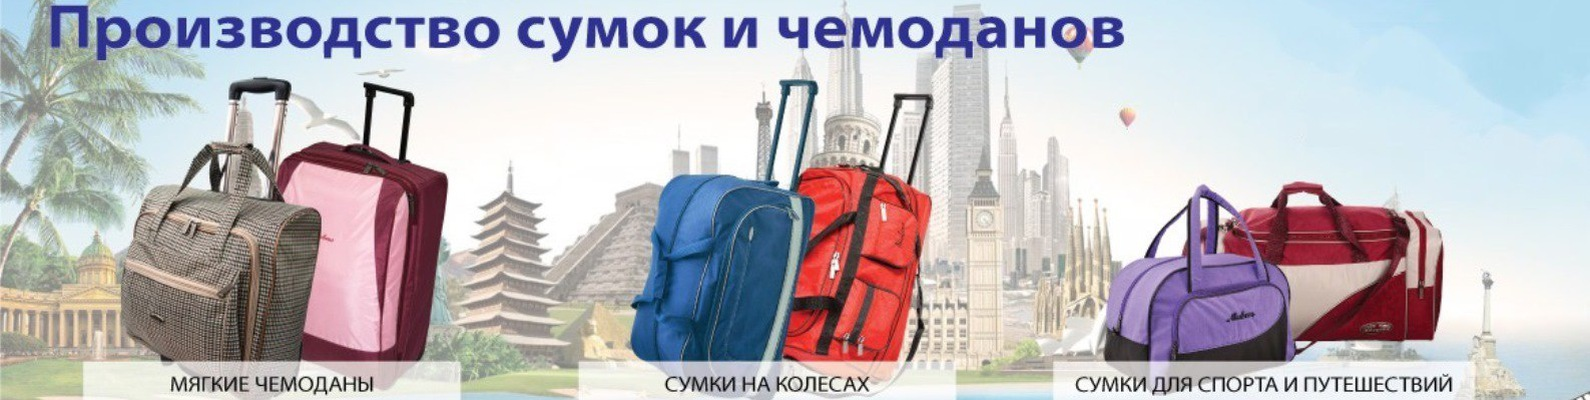 df3be9b0ed6c Дорожные сумки и чемоданы АКУБЕНС | Воронеж | ВКонтакте